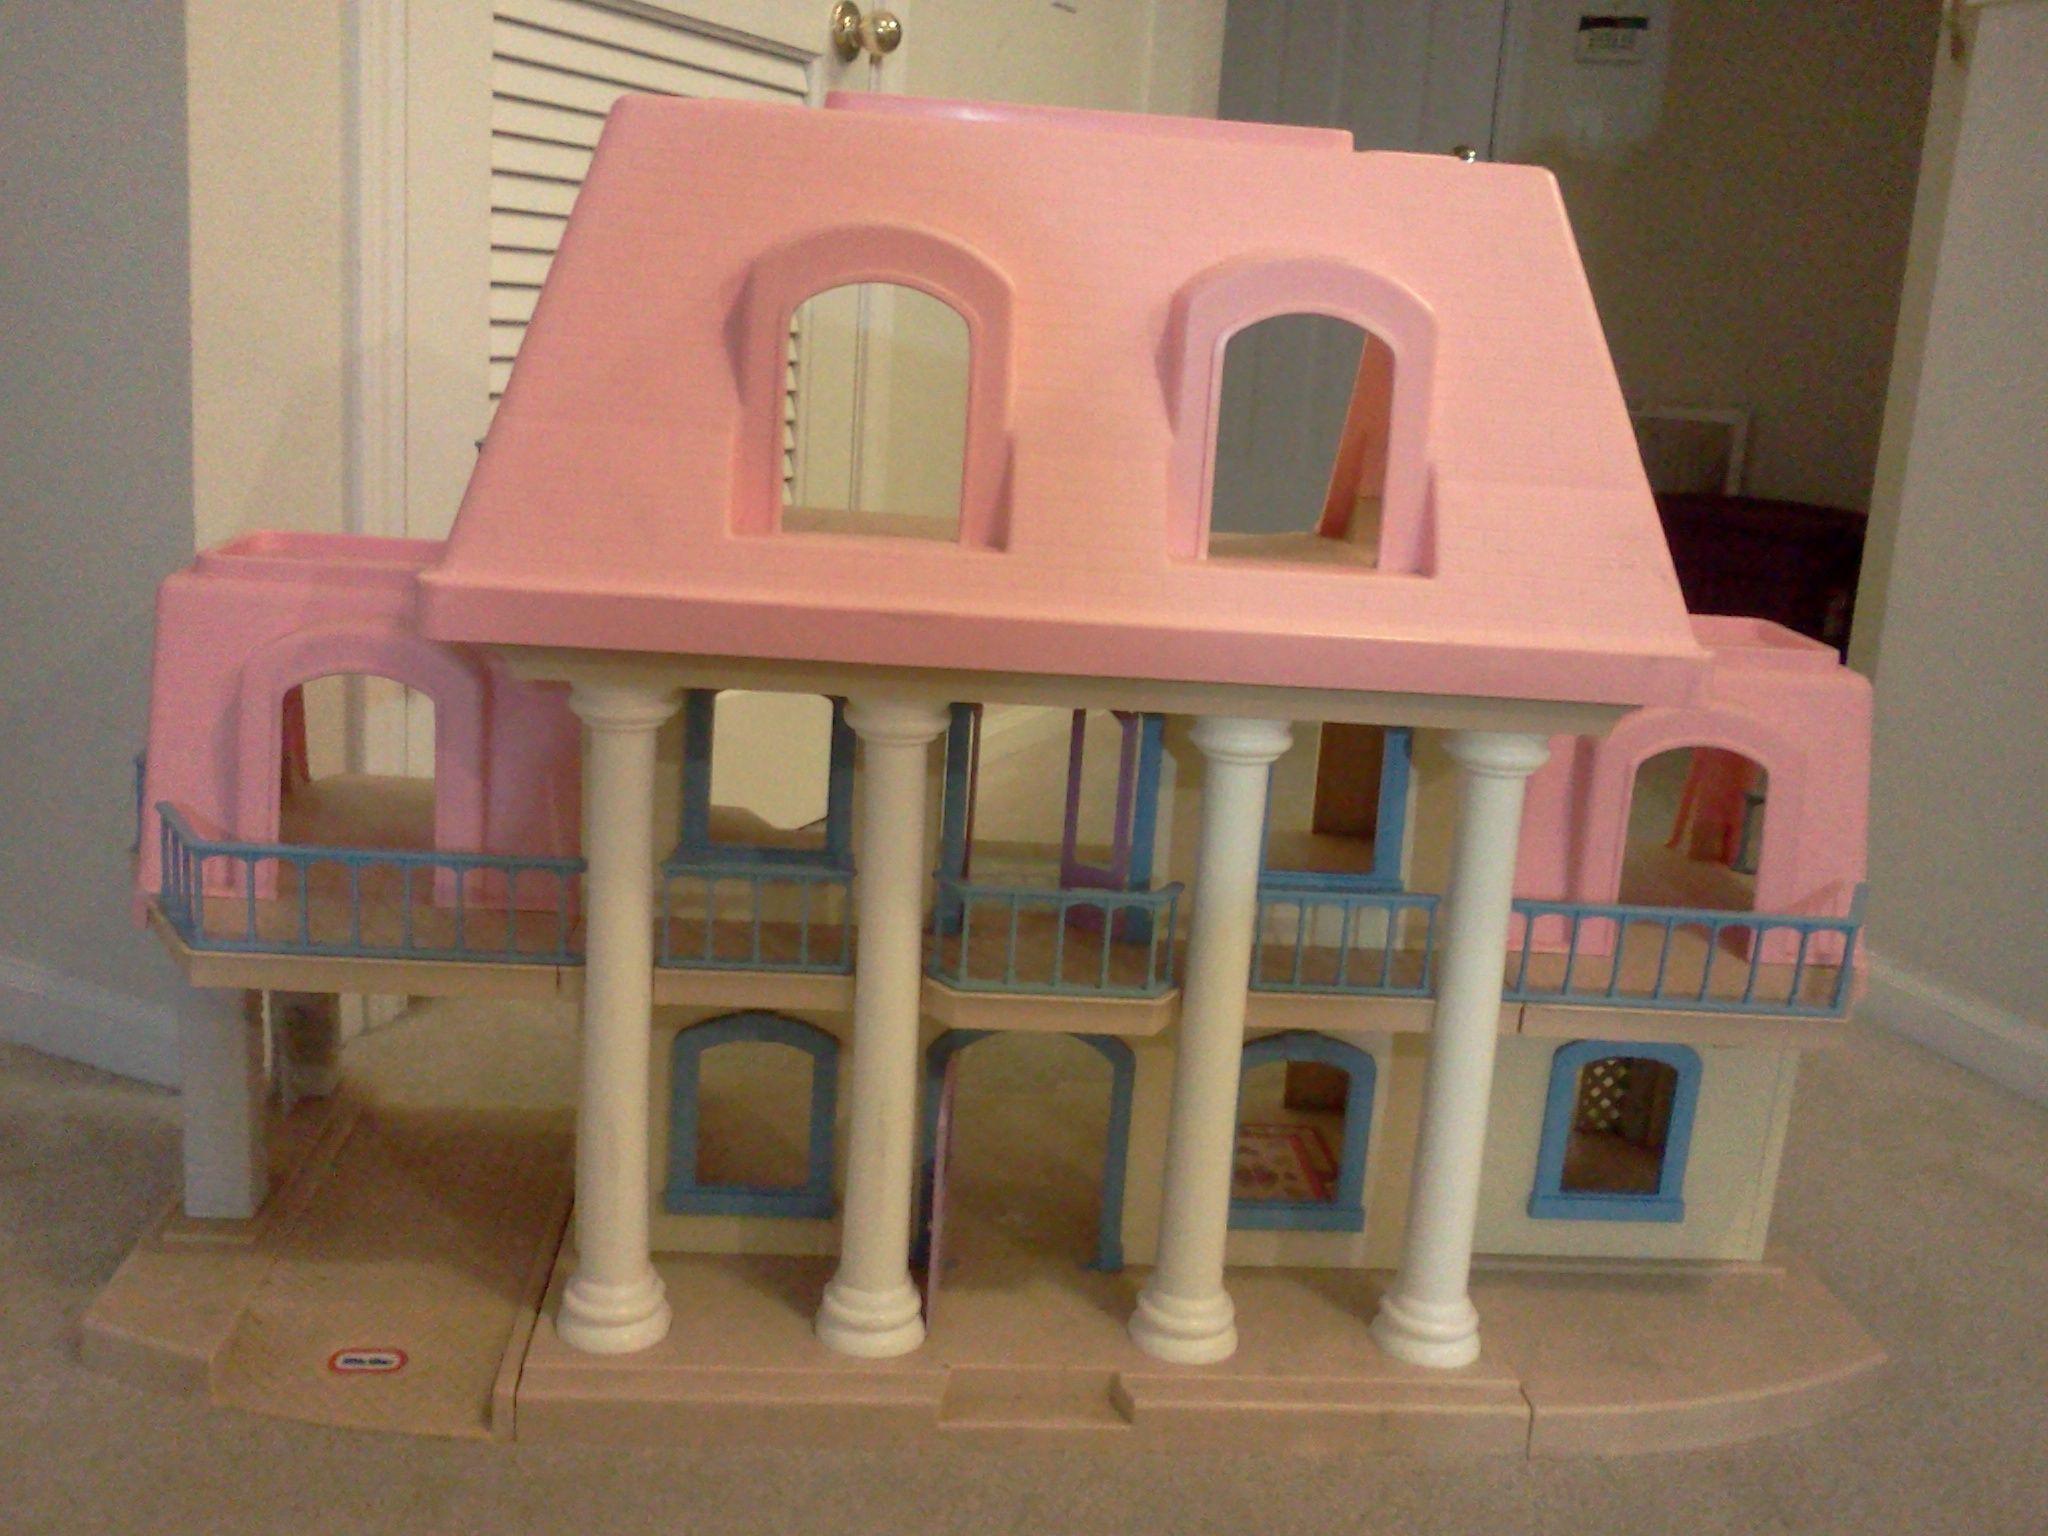 Little tikes doll house toddler bed like newrare in burlington - Vintage Little Tikes Dollhouse This Is My Doll House The Doll House